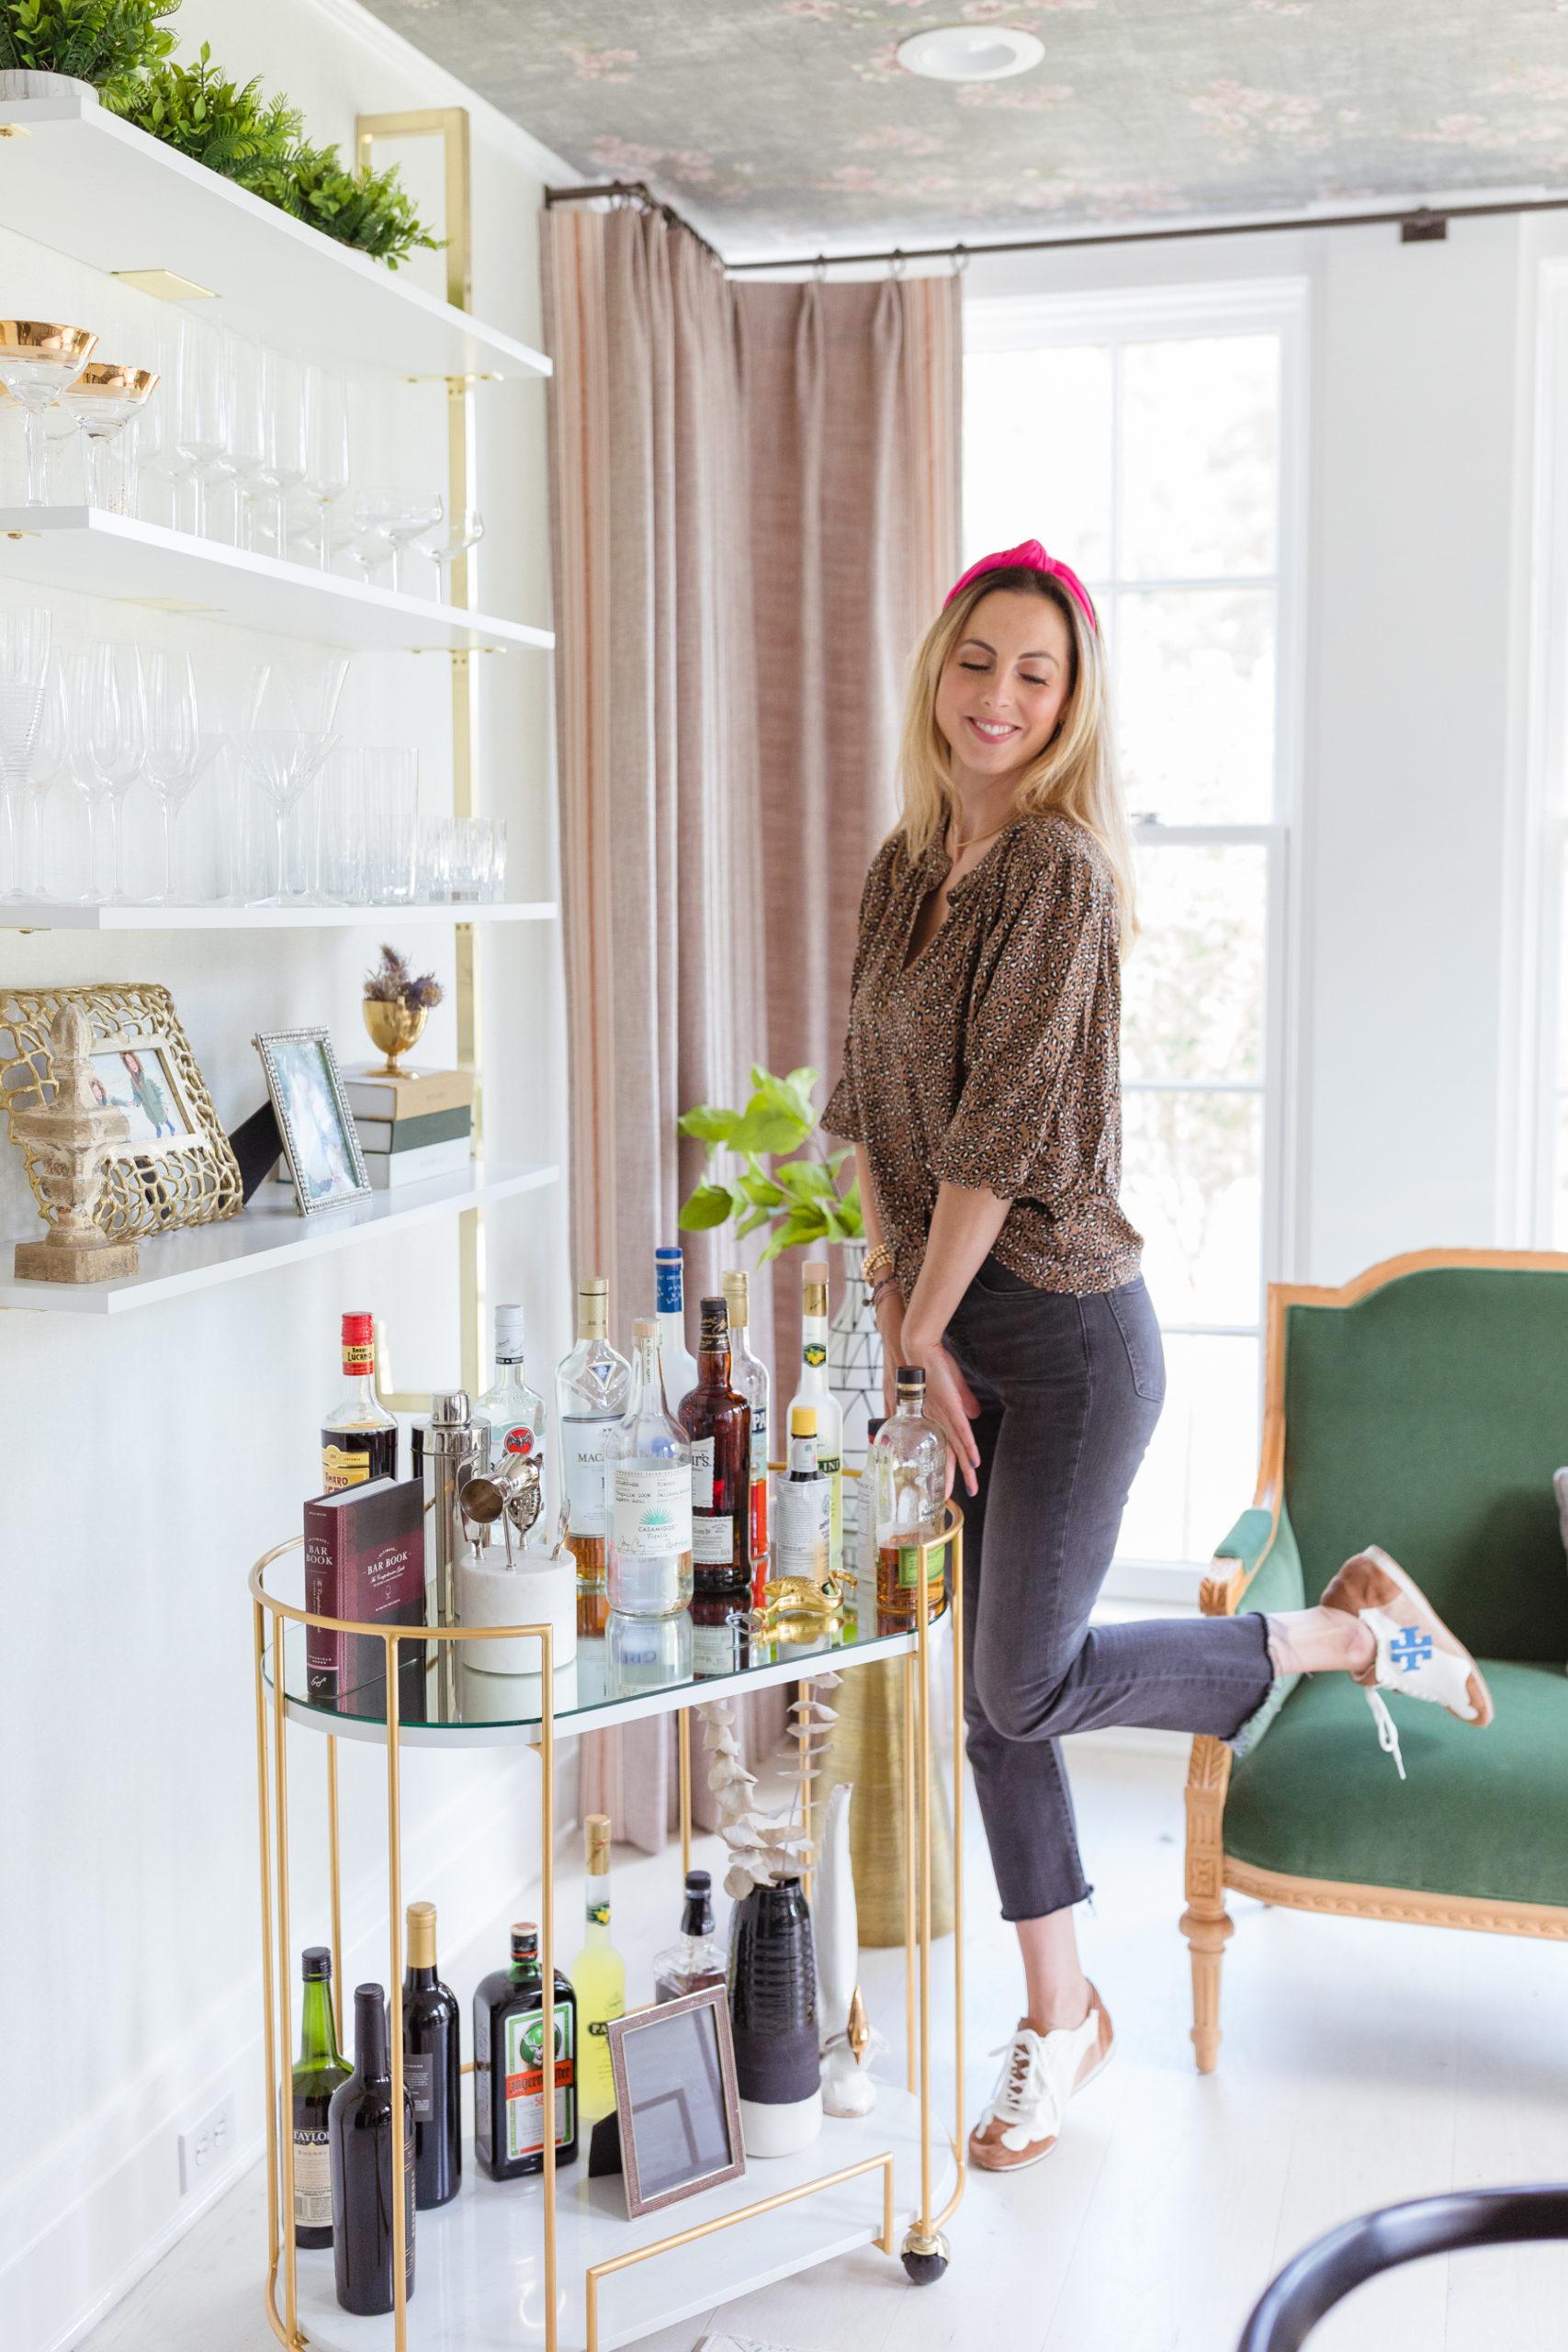 Eva Amurri shares how to set up an at-home bar